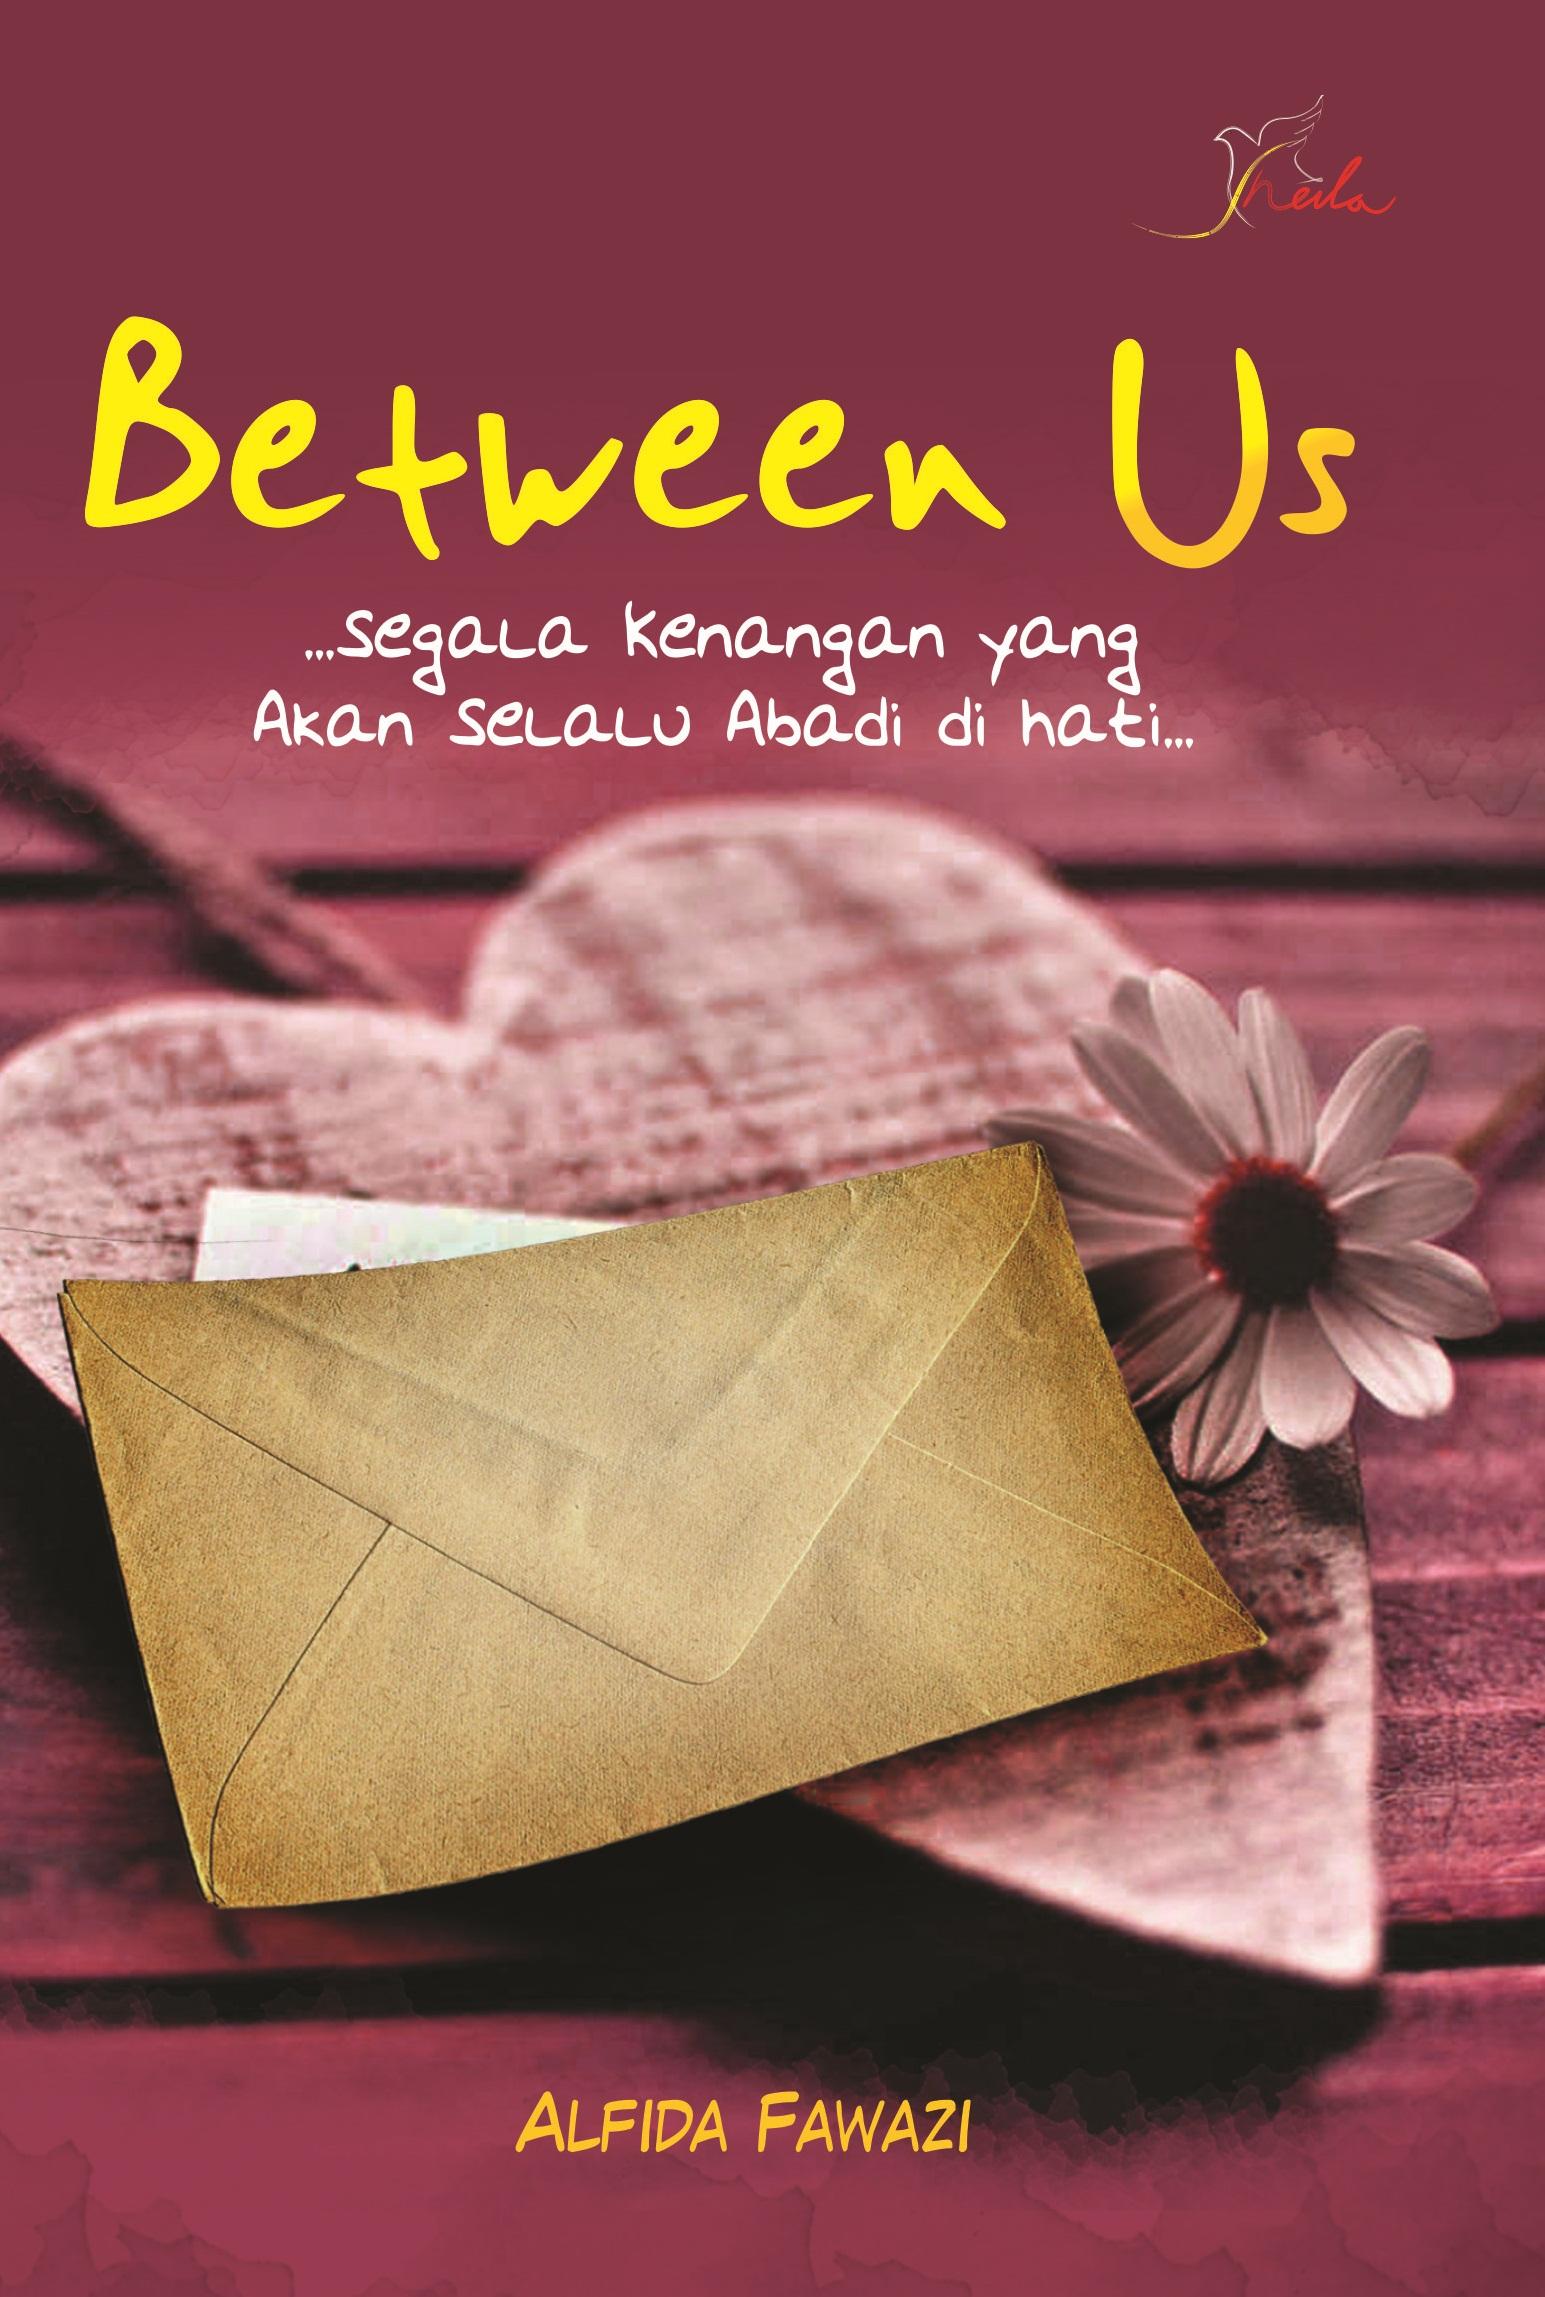 Between us, segala kenangan yang akan selalu abadi di hati [sumber elektronis]